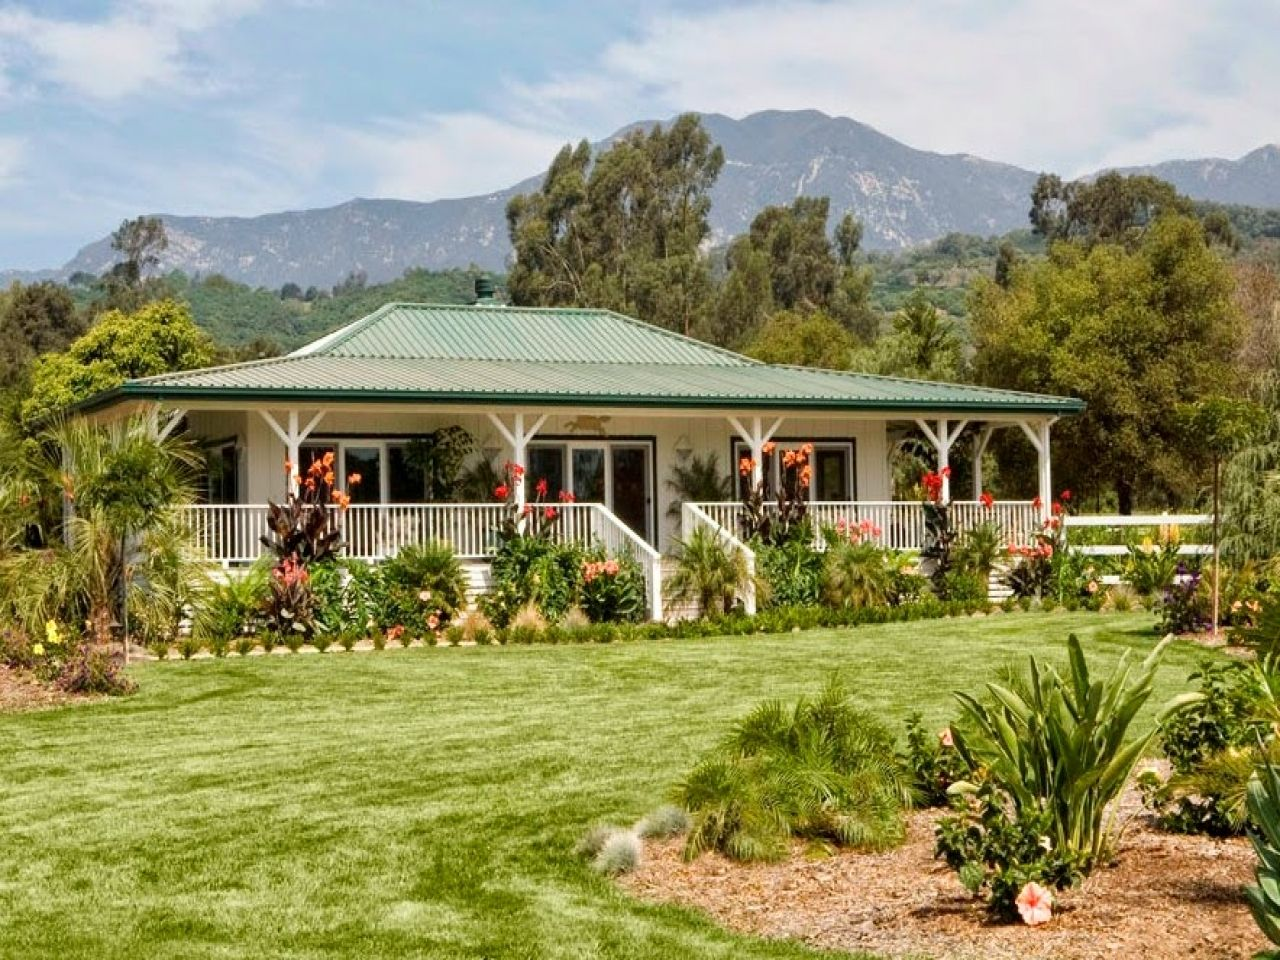 Caribbean victorian home plans caribbean plantation home plans